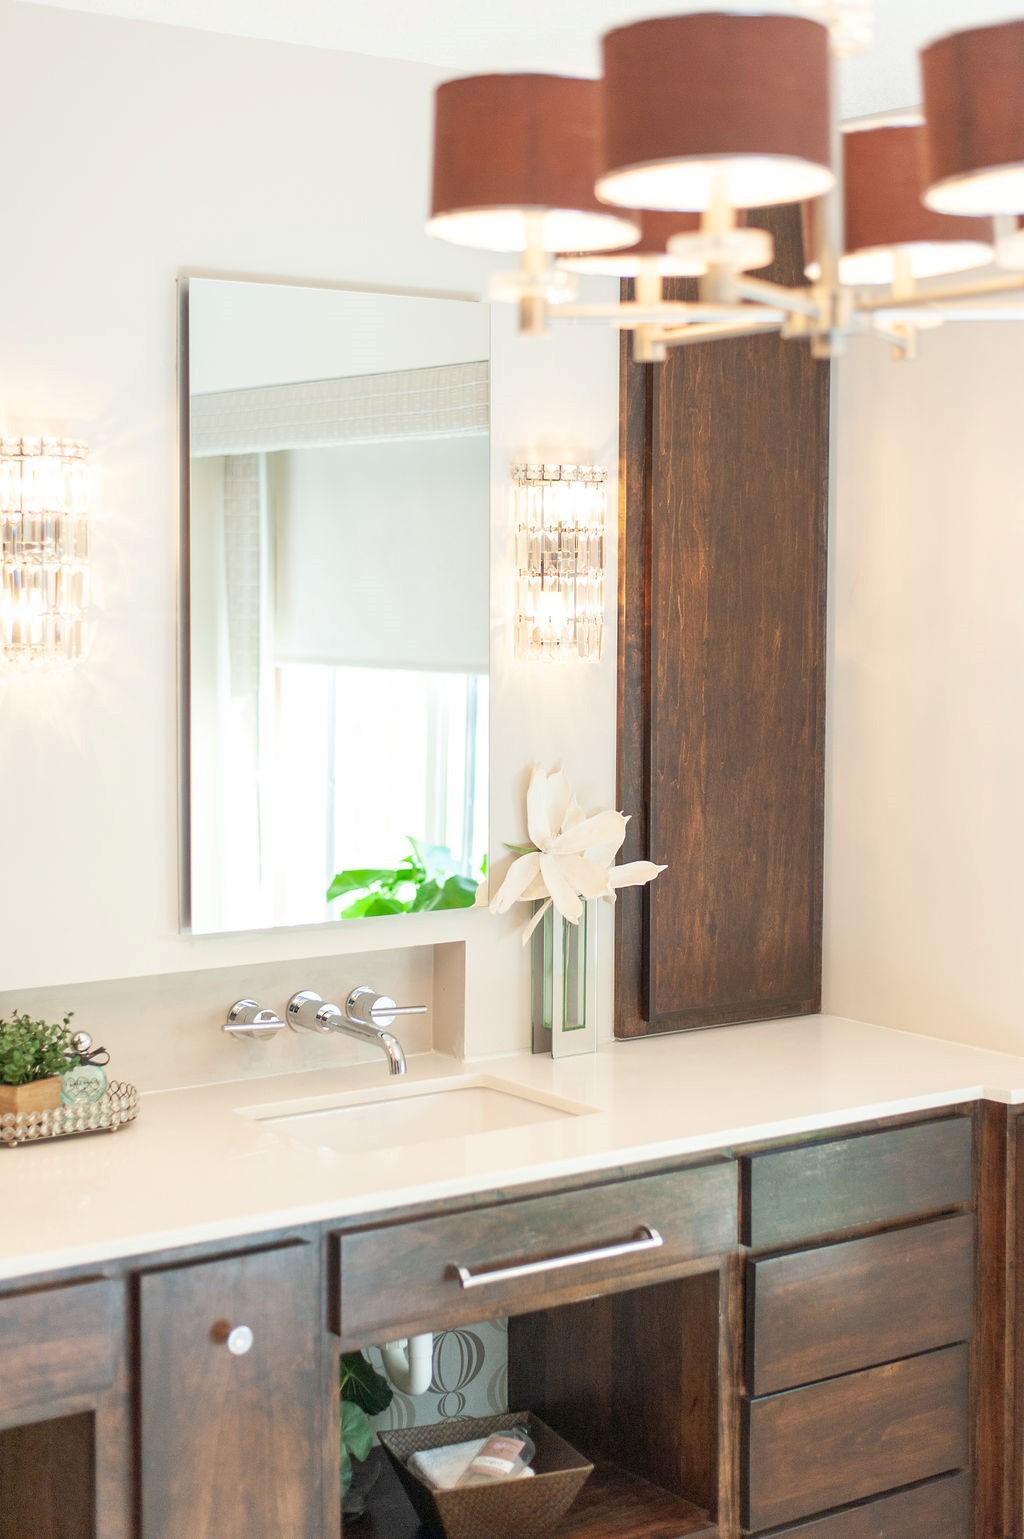 Blank-Canvas-Interior-Design-in-kansas-city-bathroom-remodel-vanity.jpg